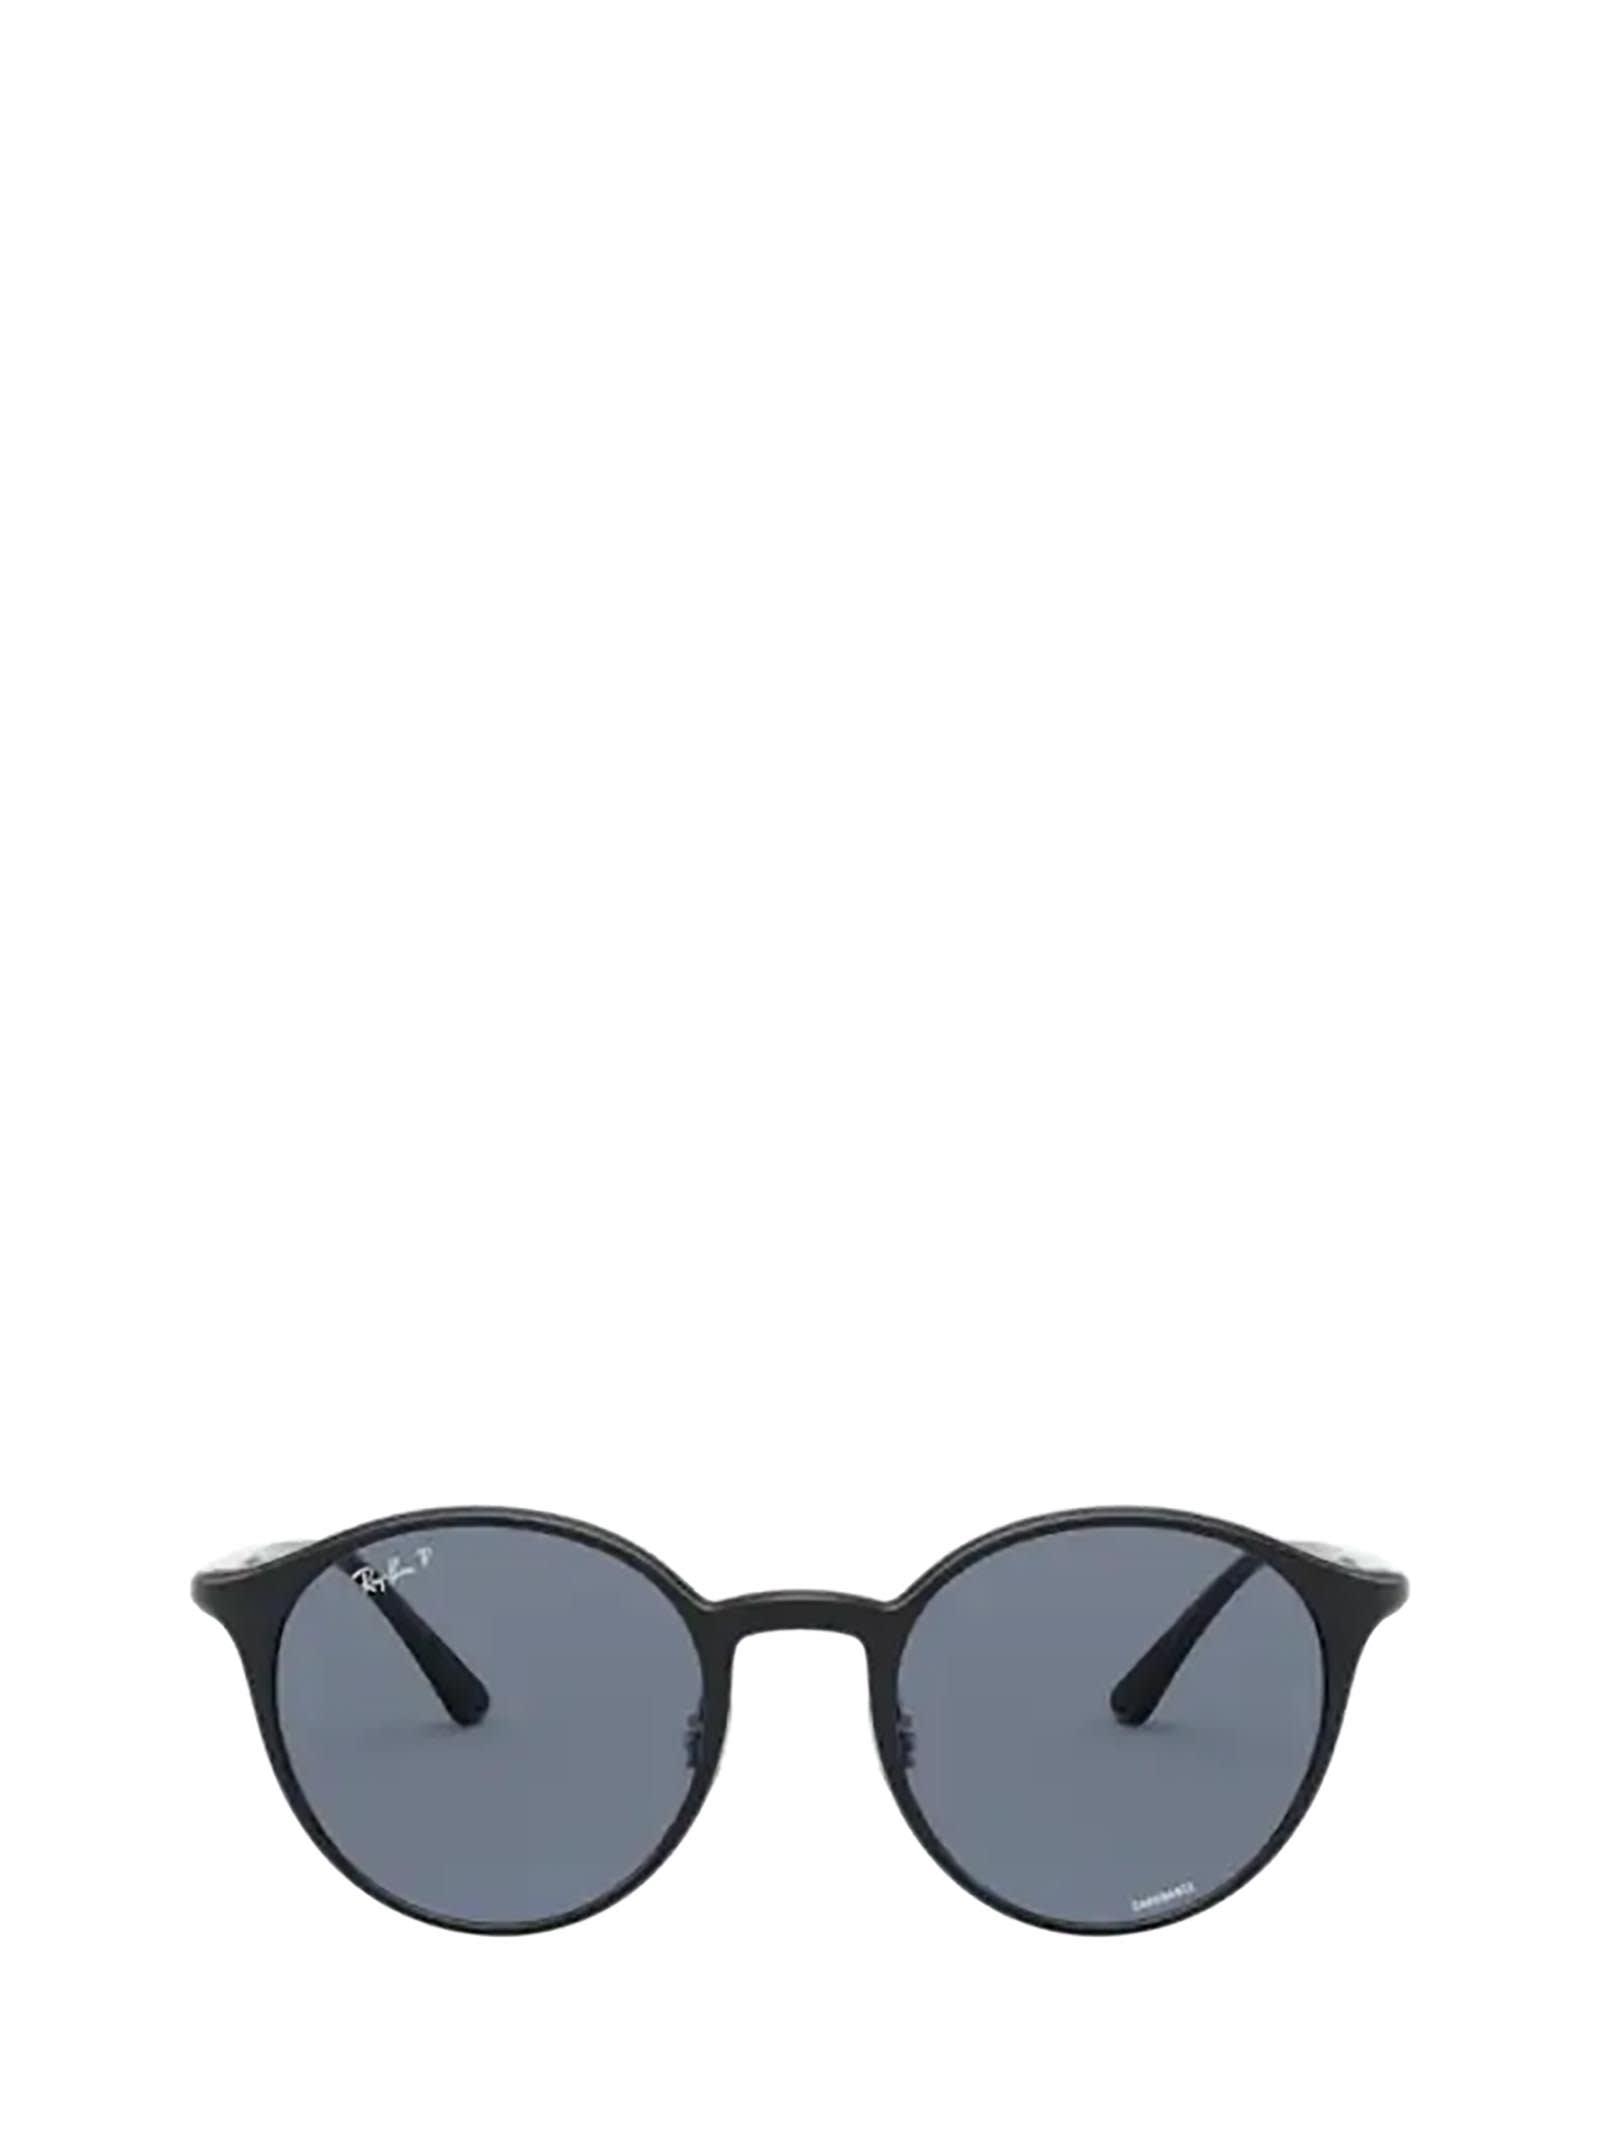 Ray-Ban Ray-ban Rb4336ch Black Sunglasses